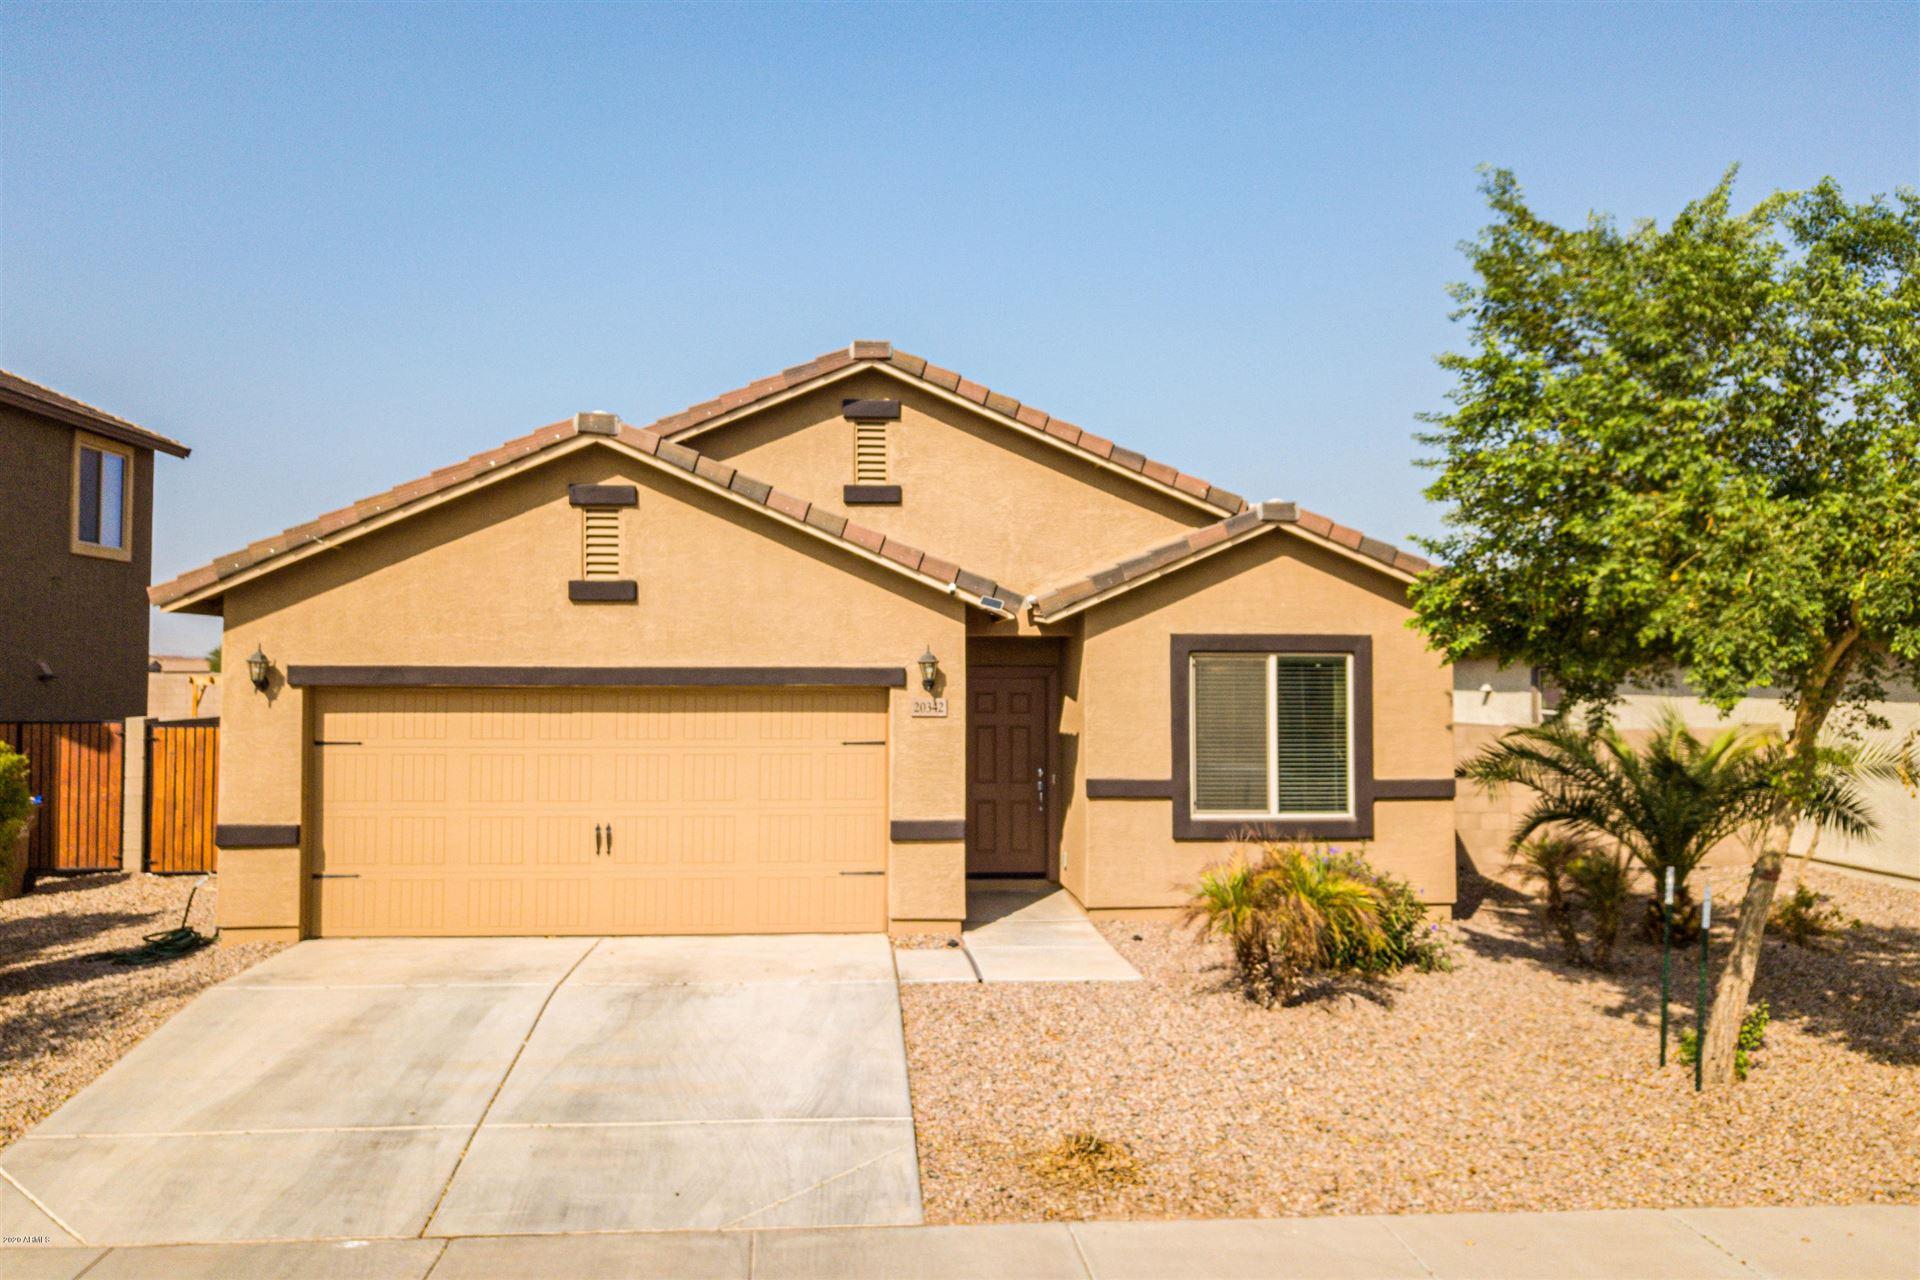 20342 N MAC NEIL Street, Maricopa, AZ 85138 - MLS#: 6133725